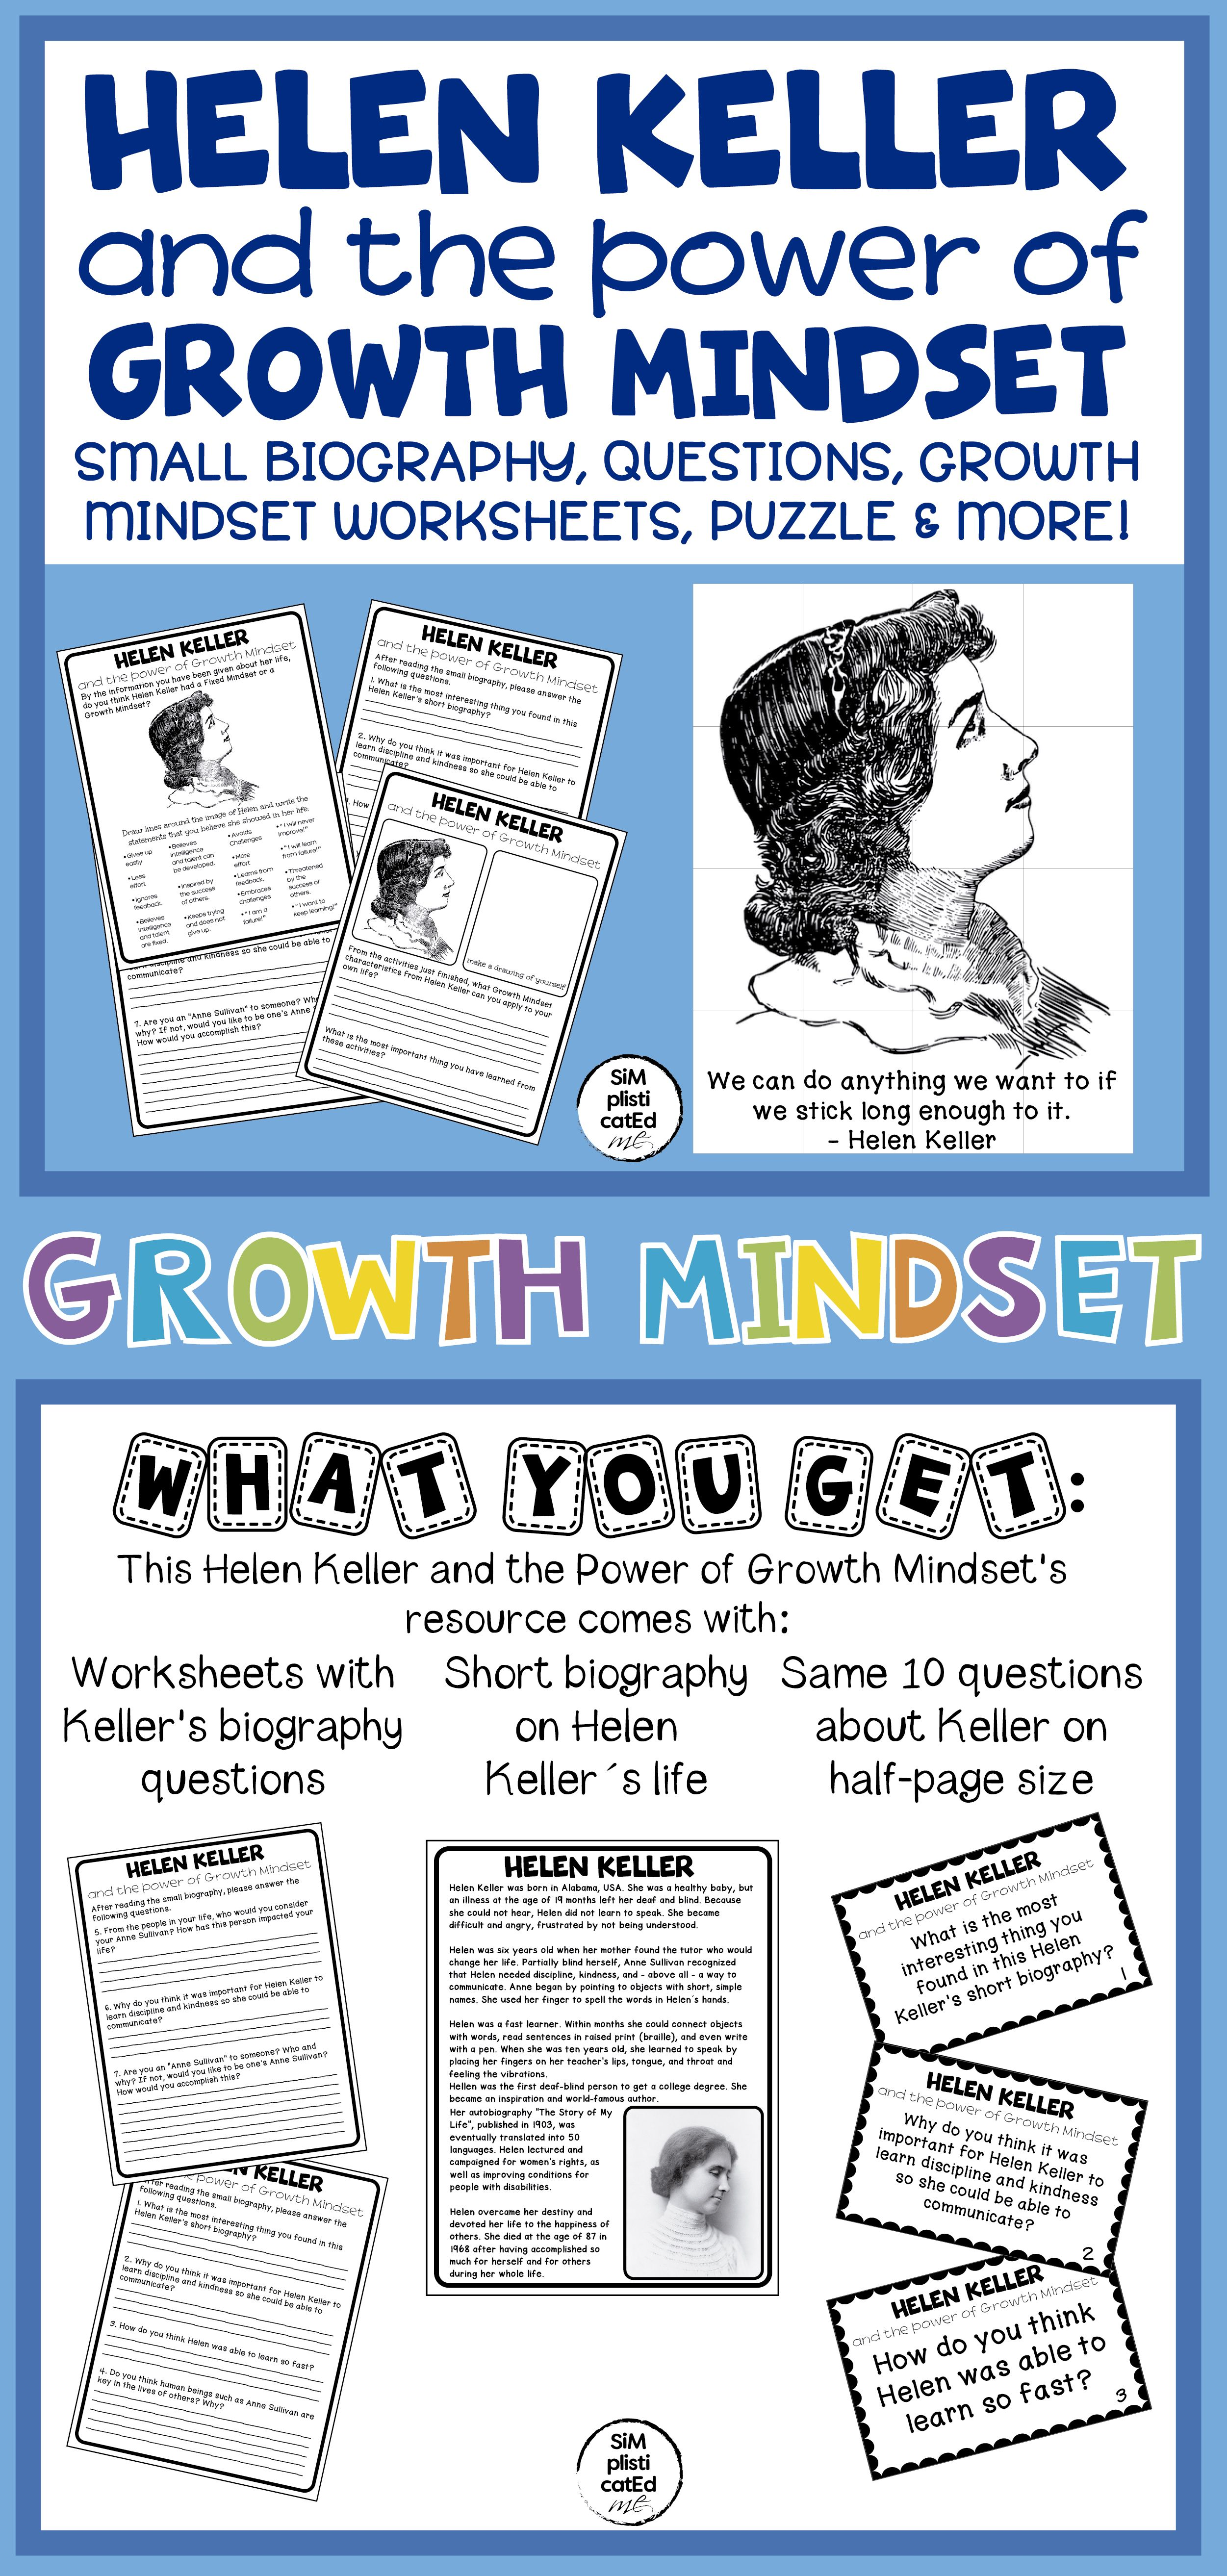 hight resolution of Worksheets Helen Keller Elementary   Printable Worksheets and Activities  for Teachers